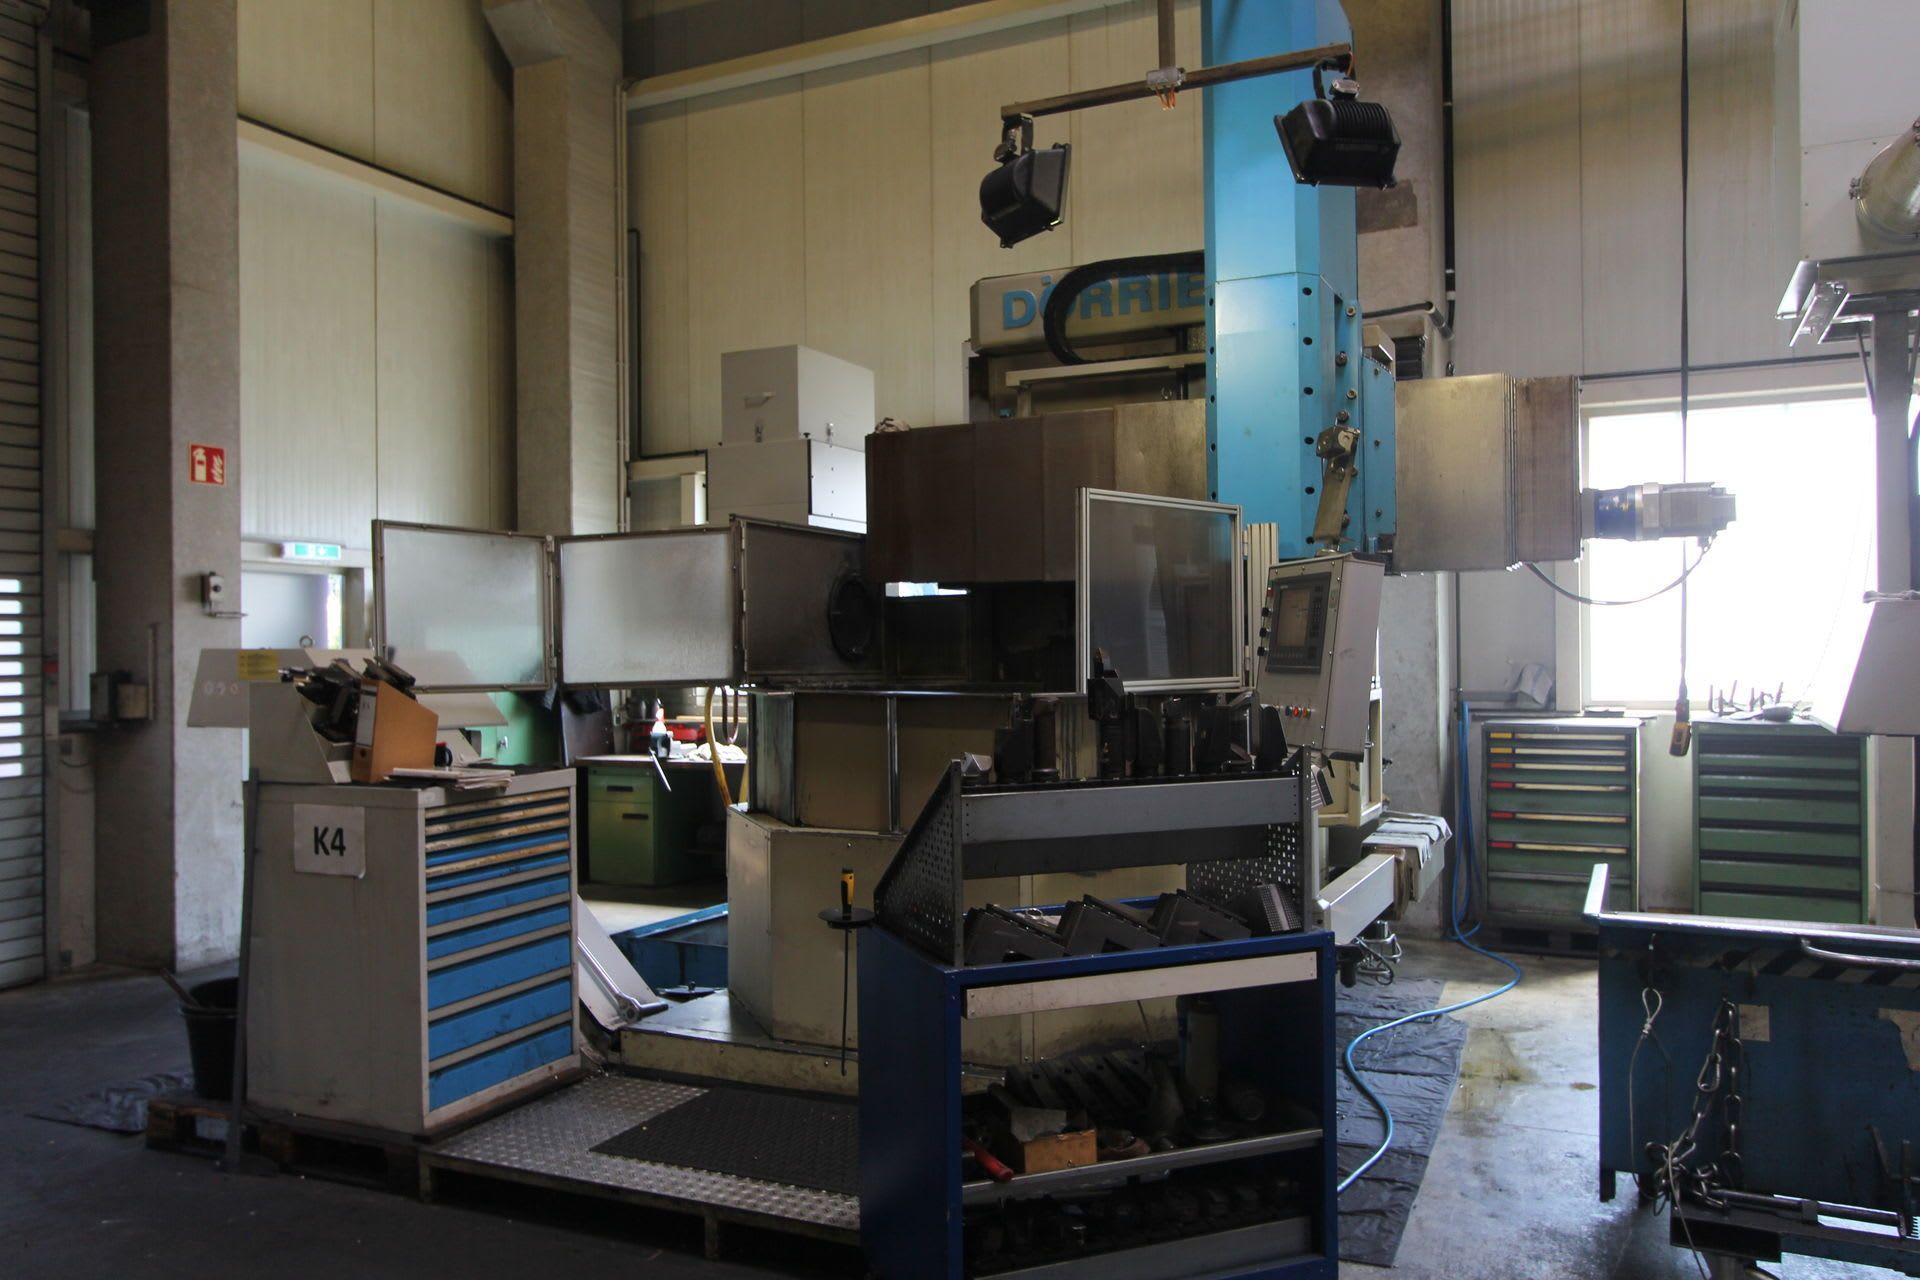 DÖRRIES SDE CNC-Karusselldrehmaschine